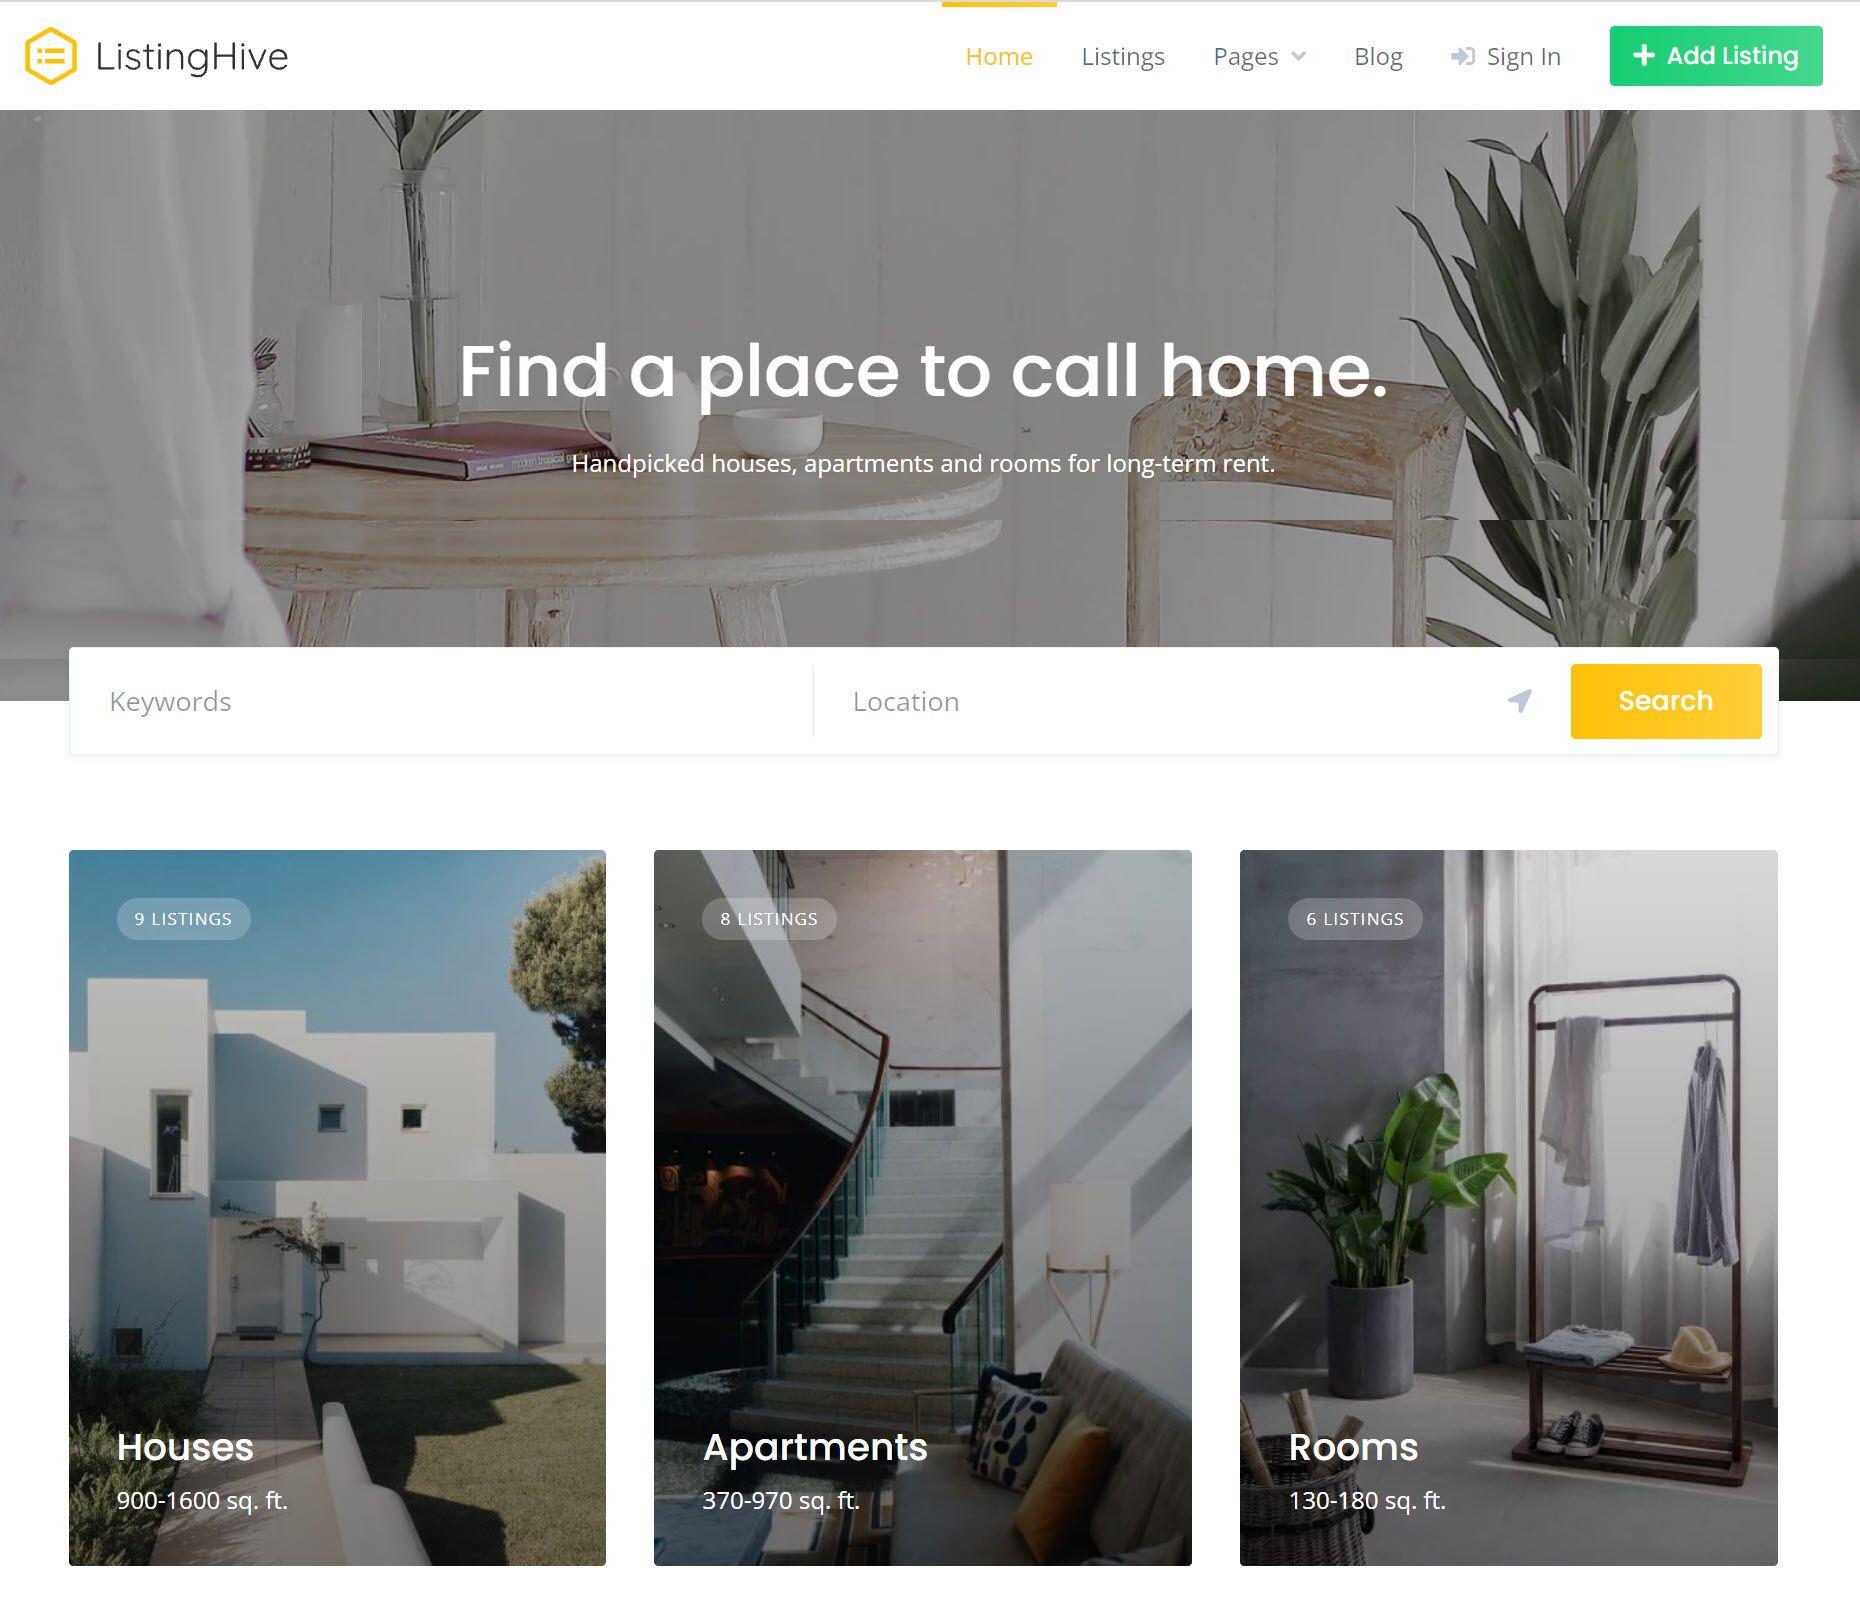 ListingHive Directory Theme Screenshot